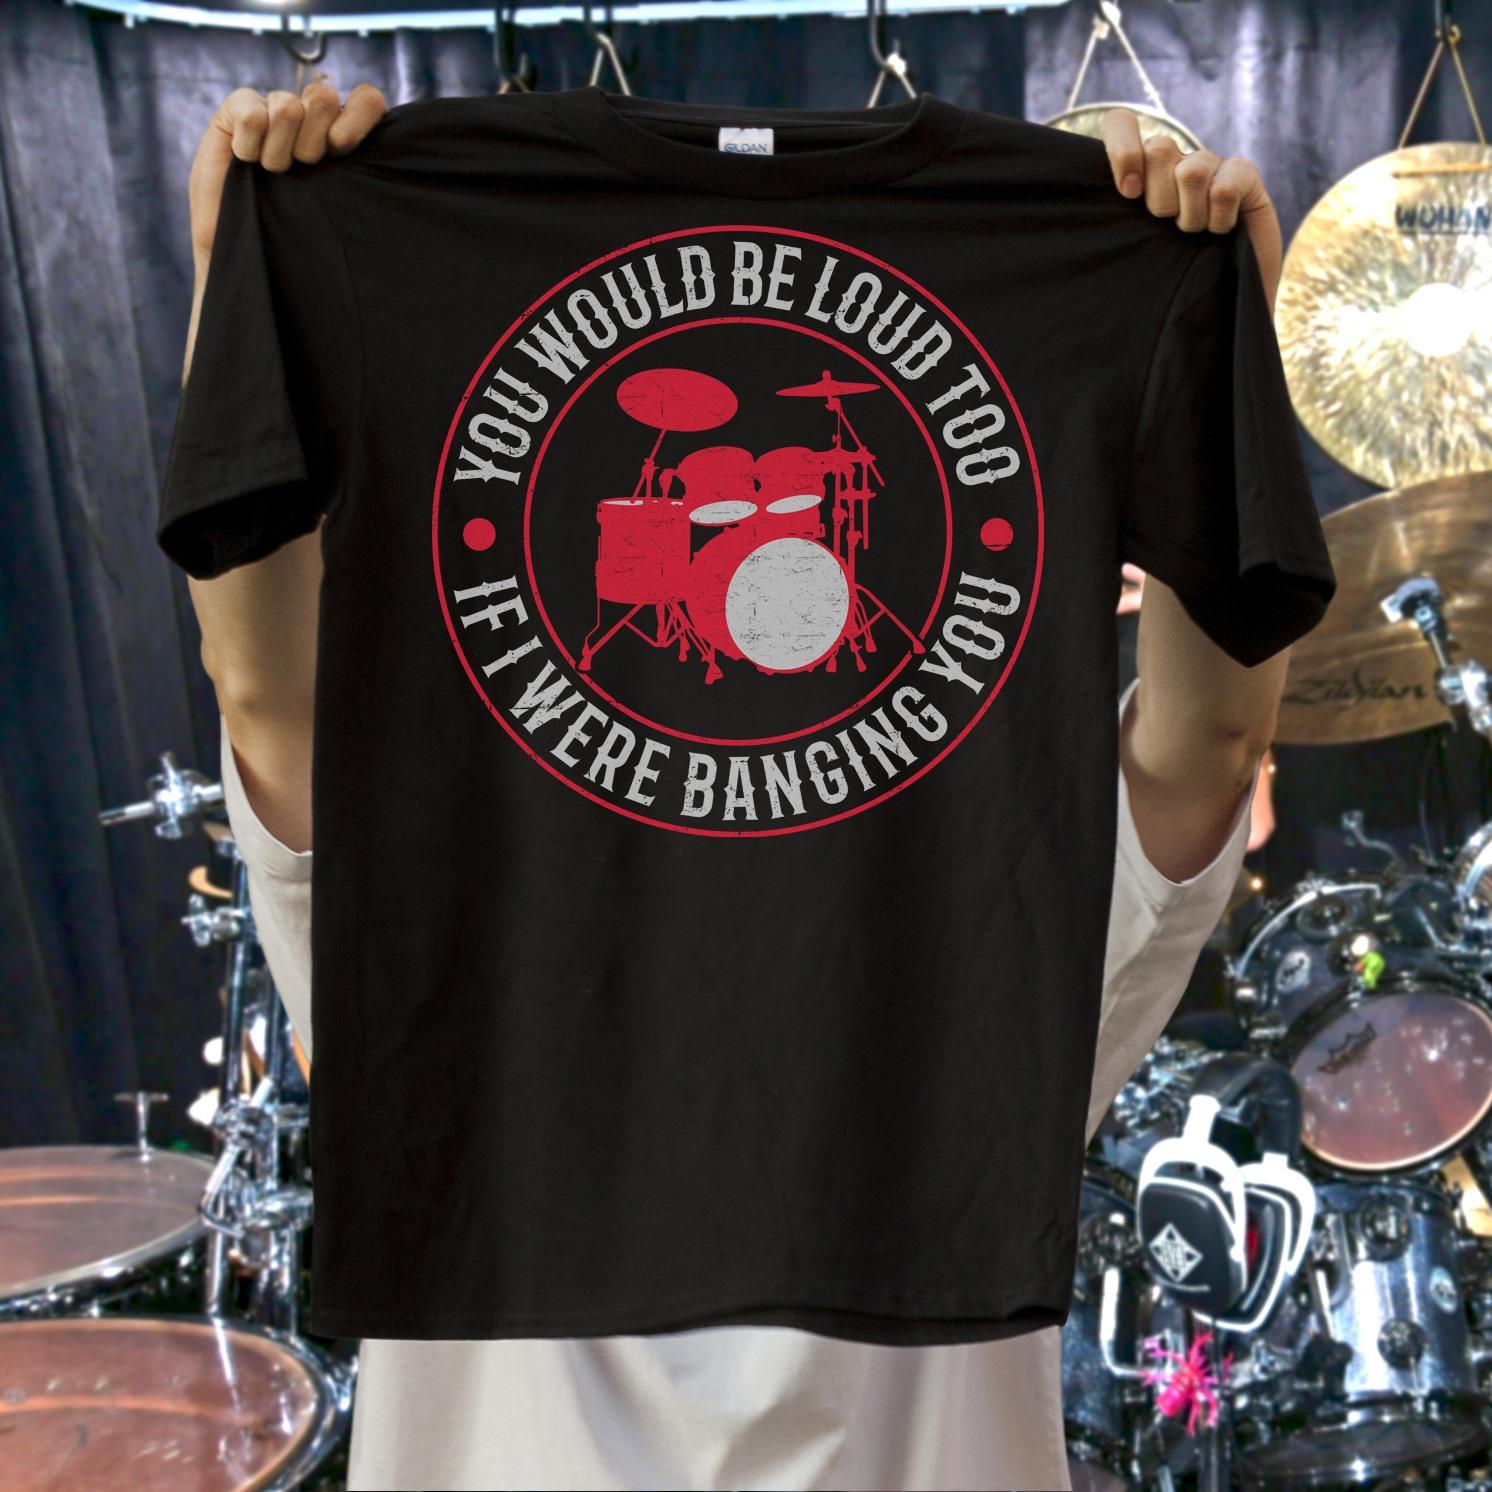 You would be loud too if I were banging you shirt